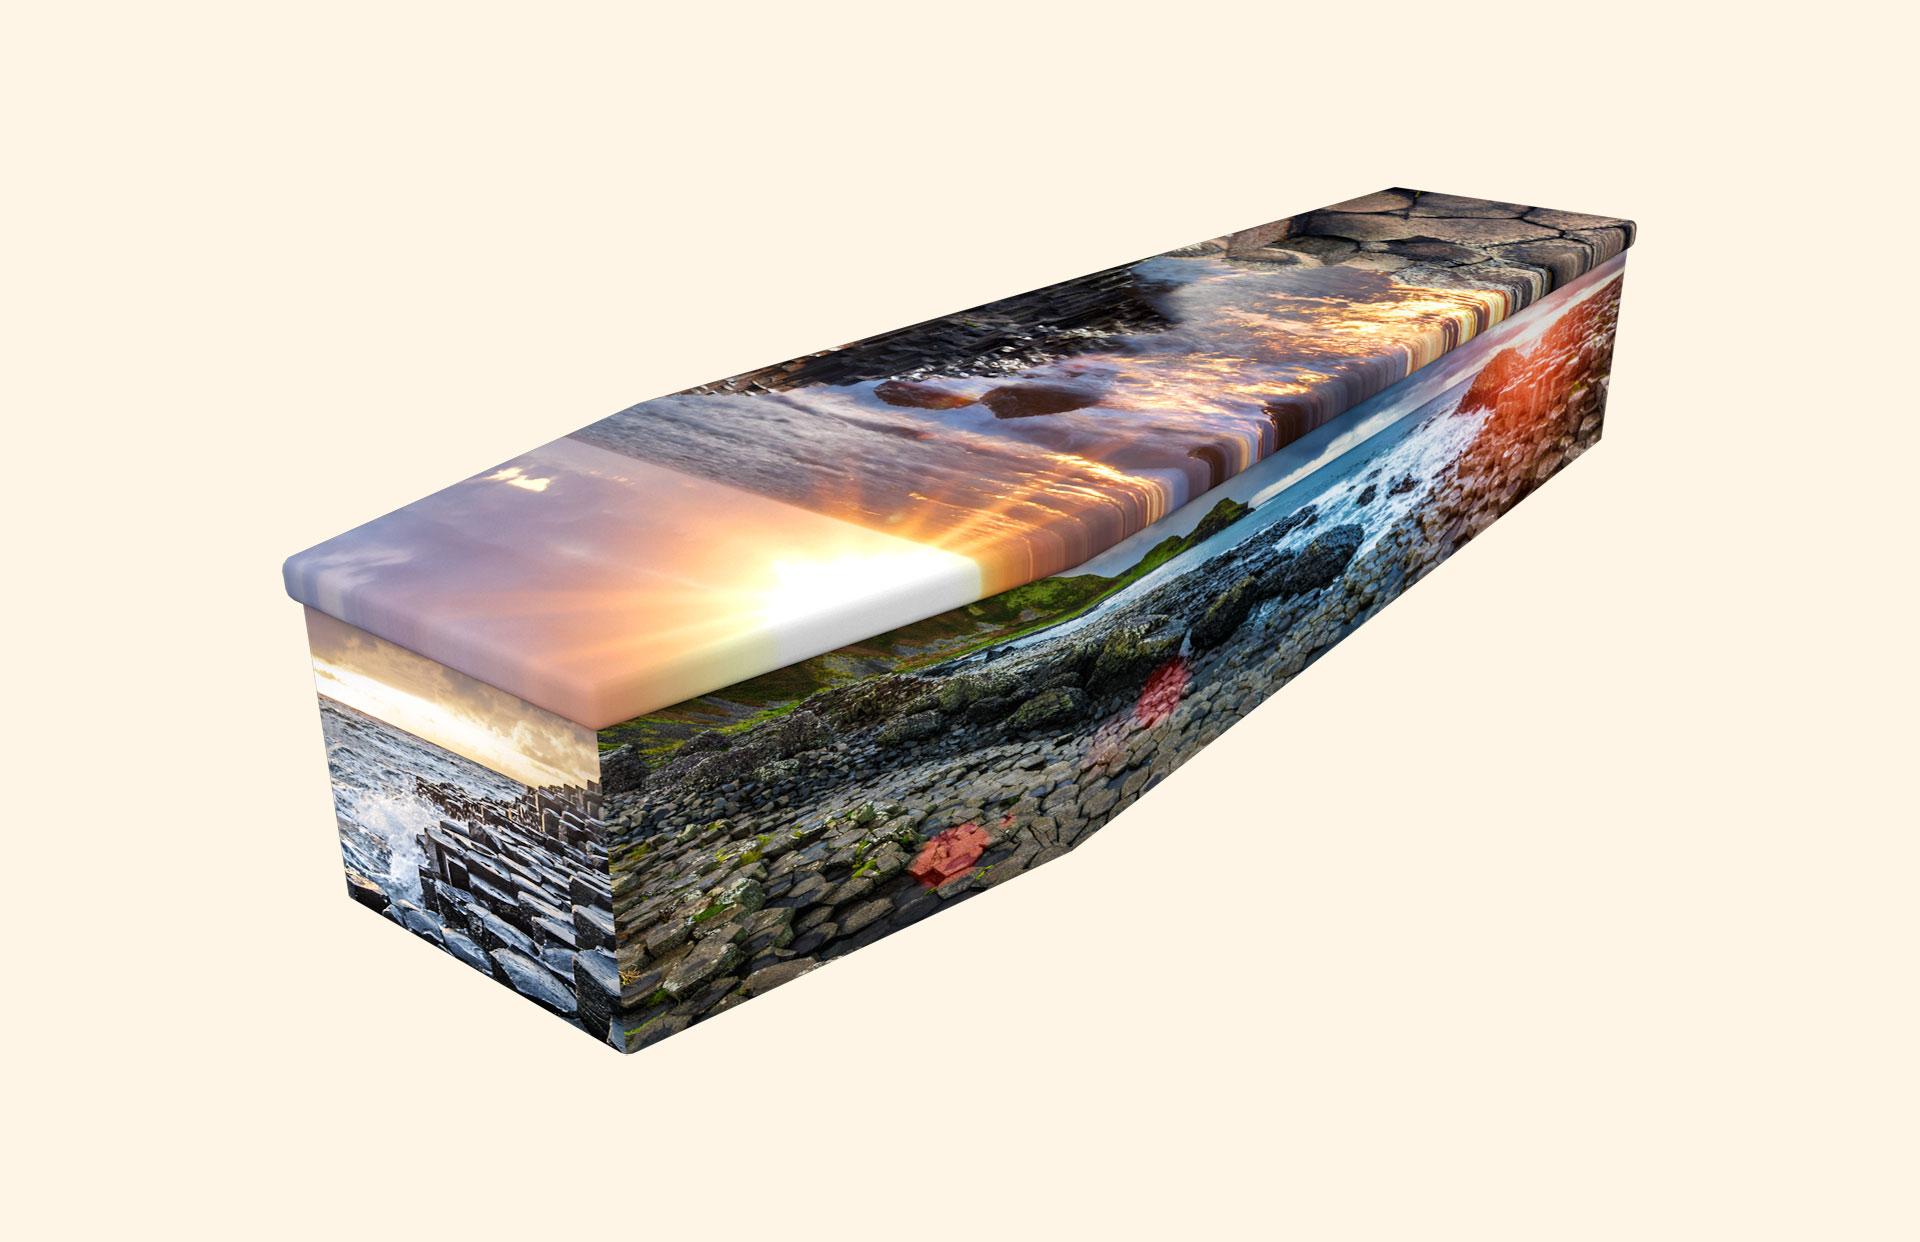 Giant's Causeway cardboard coffin